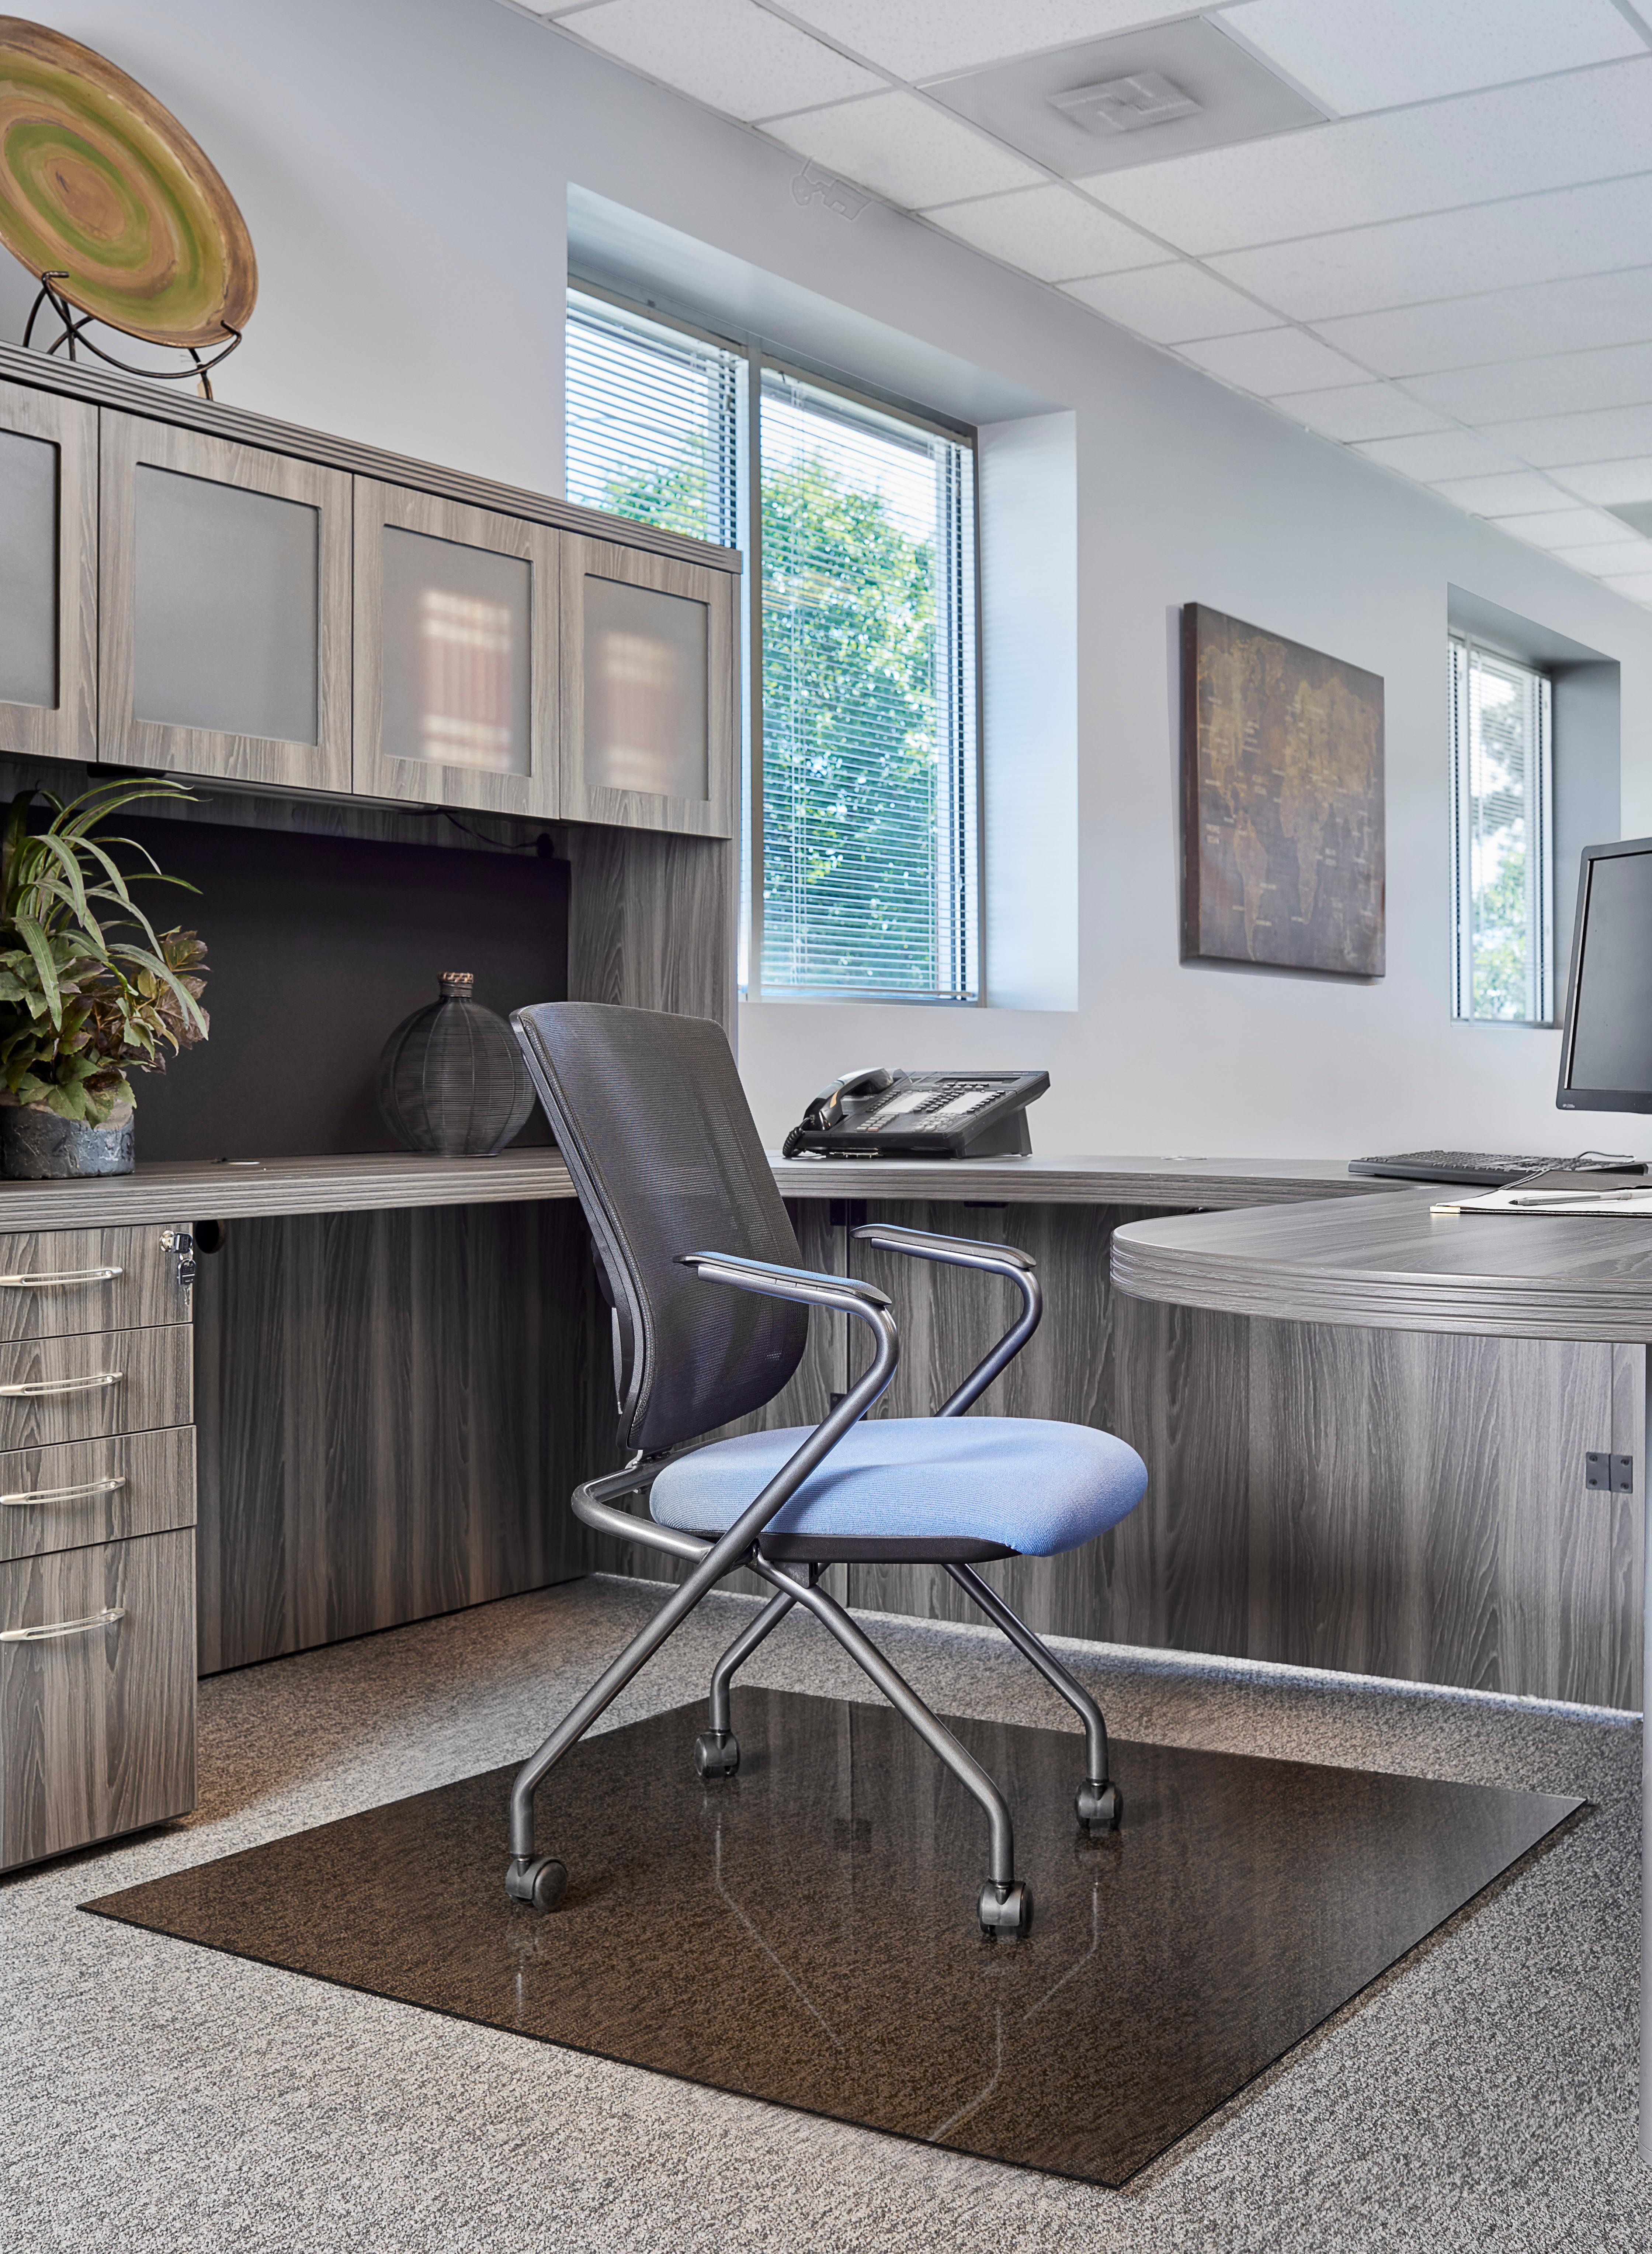 Denver Glass Interiors Moltin Glass Chair Mats Grey Tint Private Office